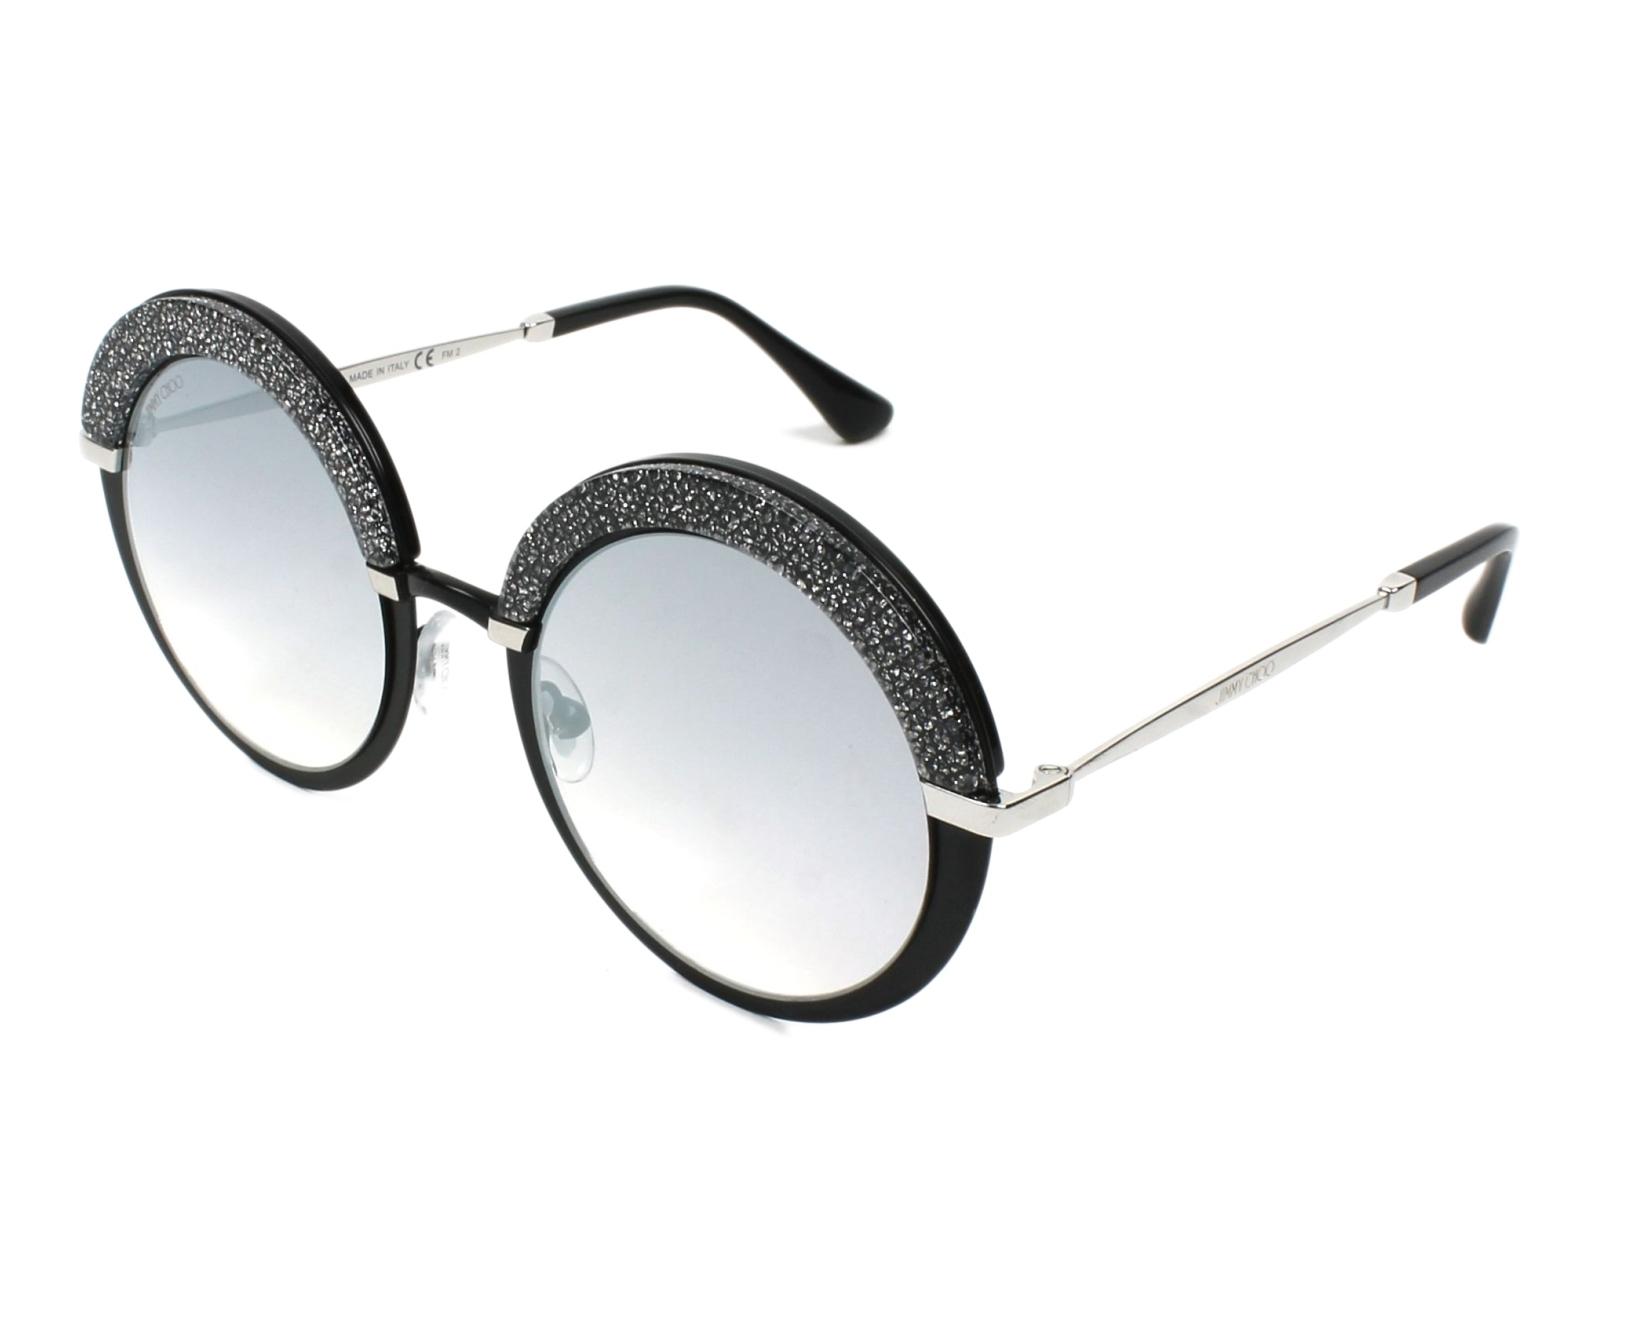 5958fcb3cf98 Sunglasses Jimmy Choo GOTHA-S IXA FU 50-22 Black profile view